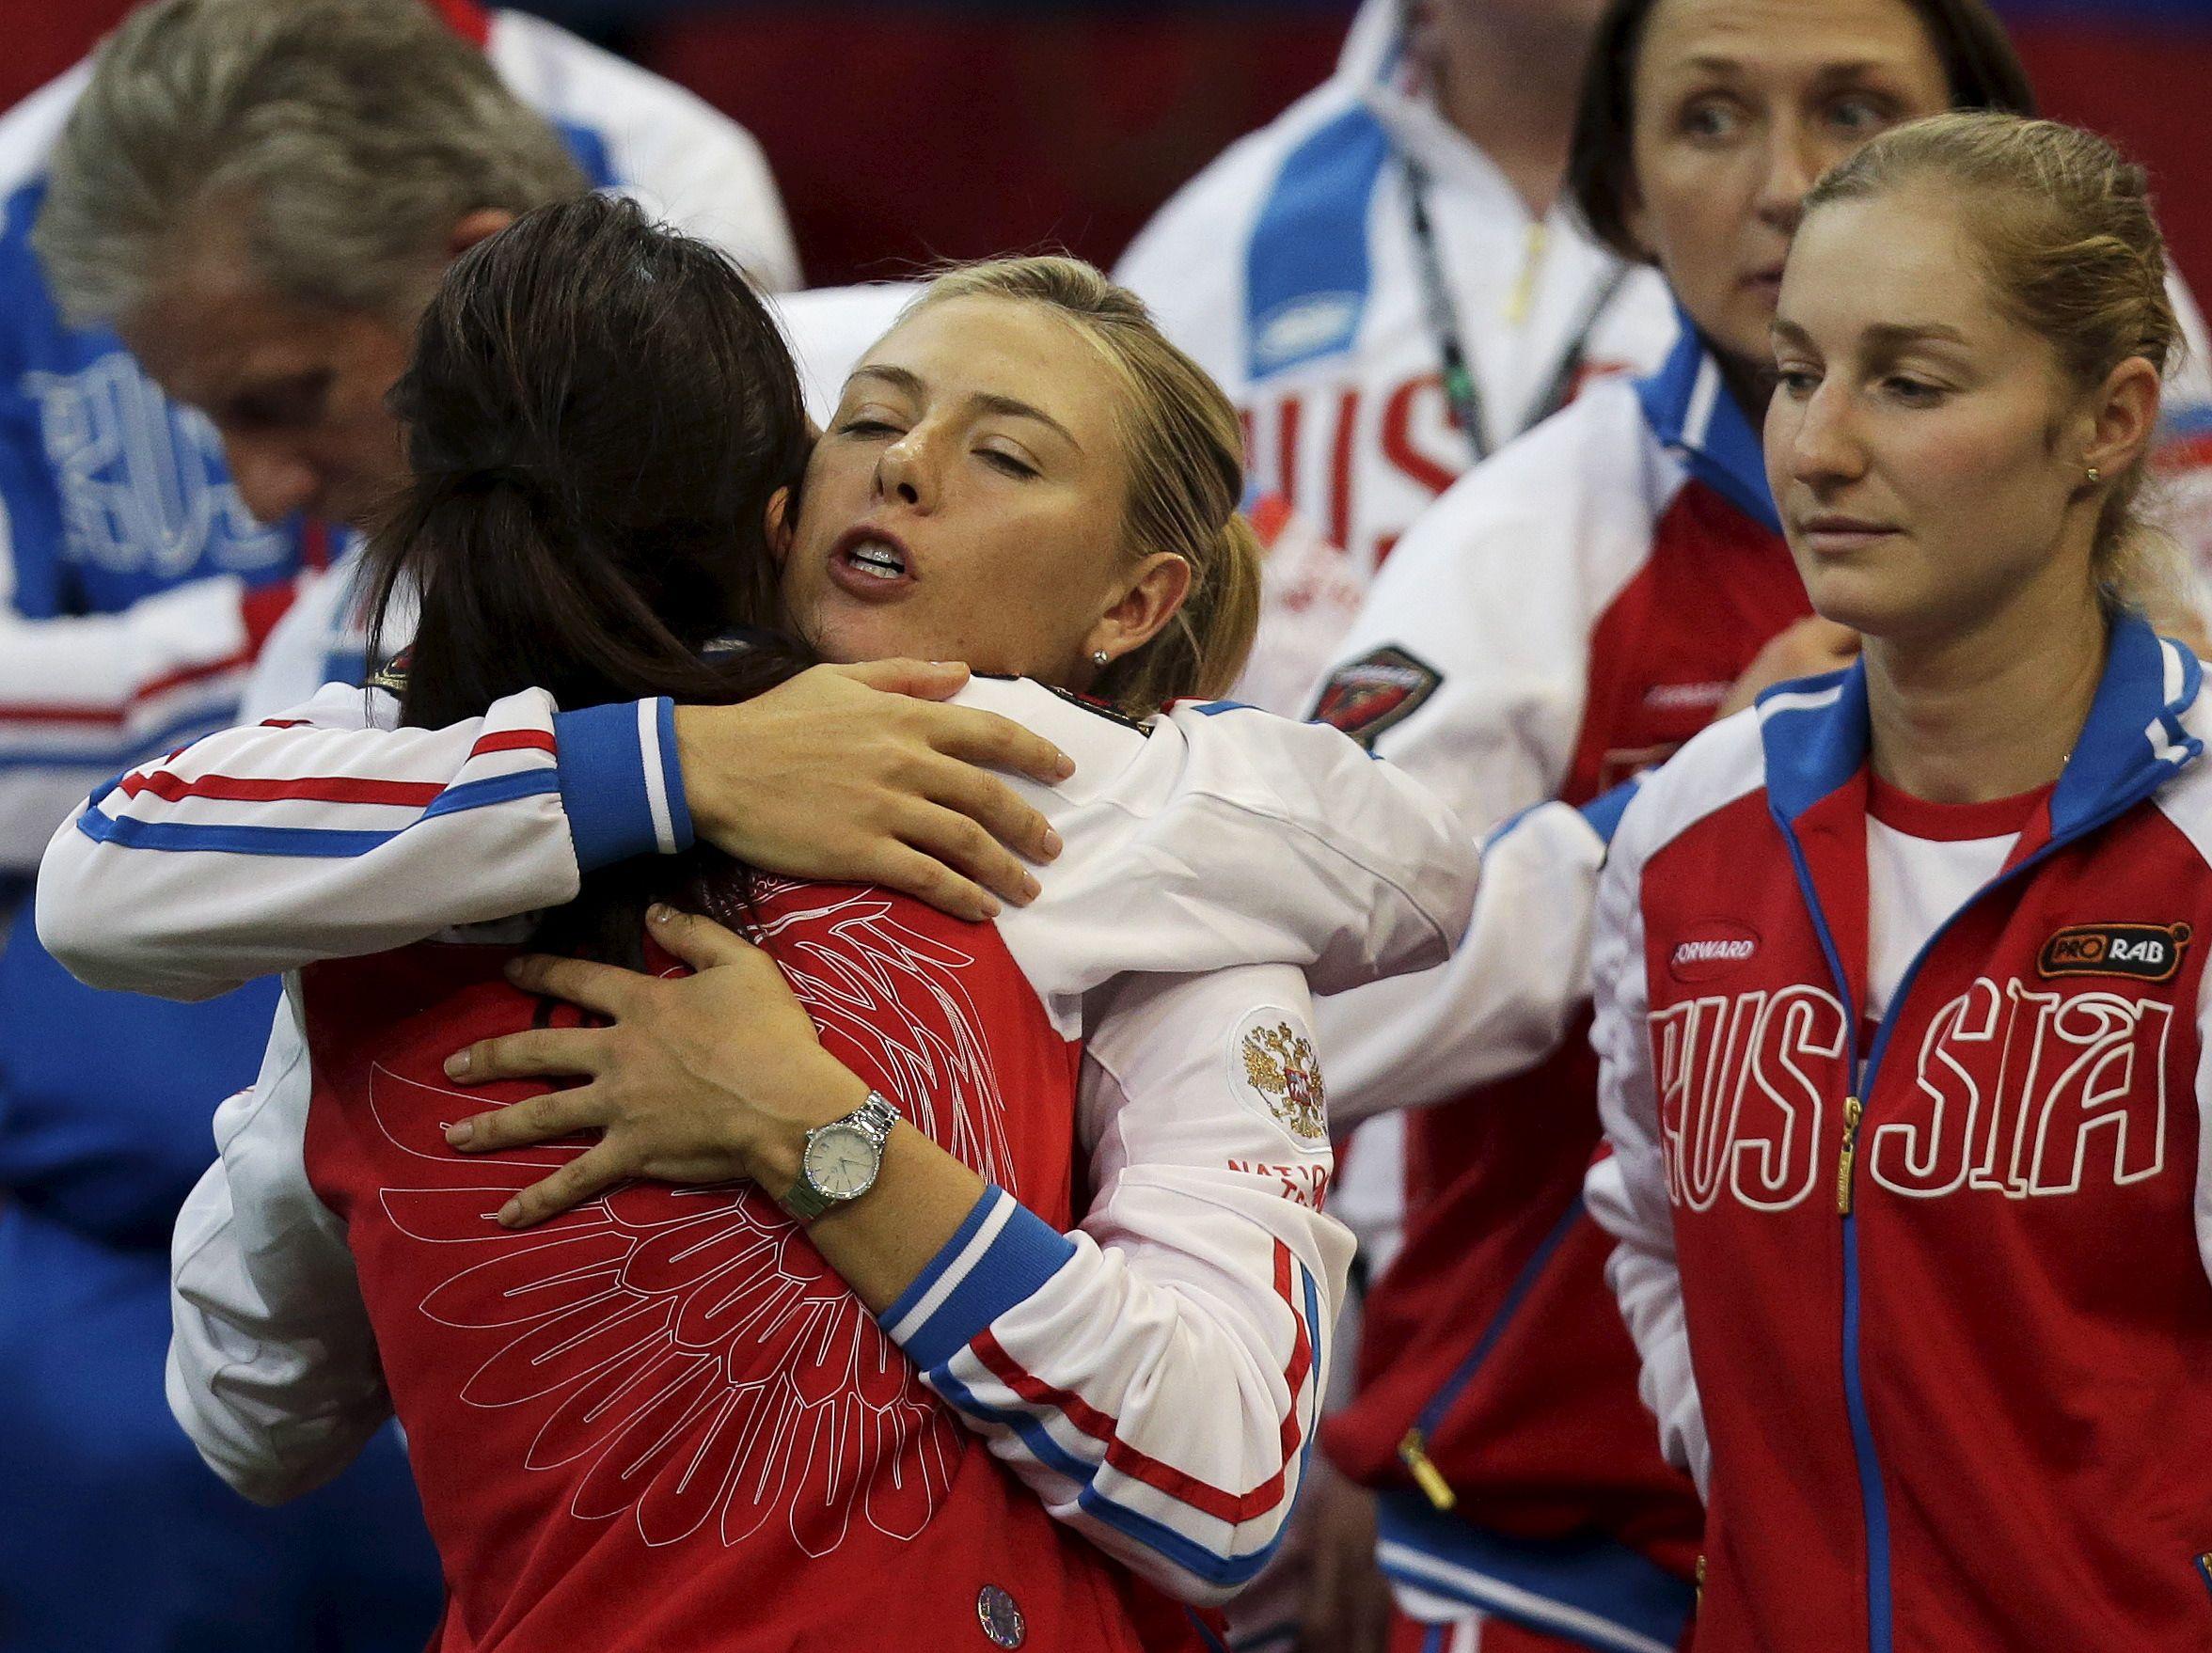 Sharapova and team Russia